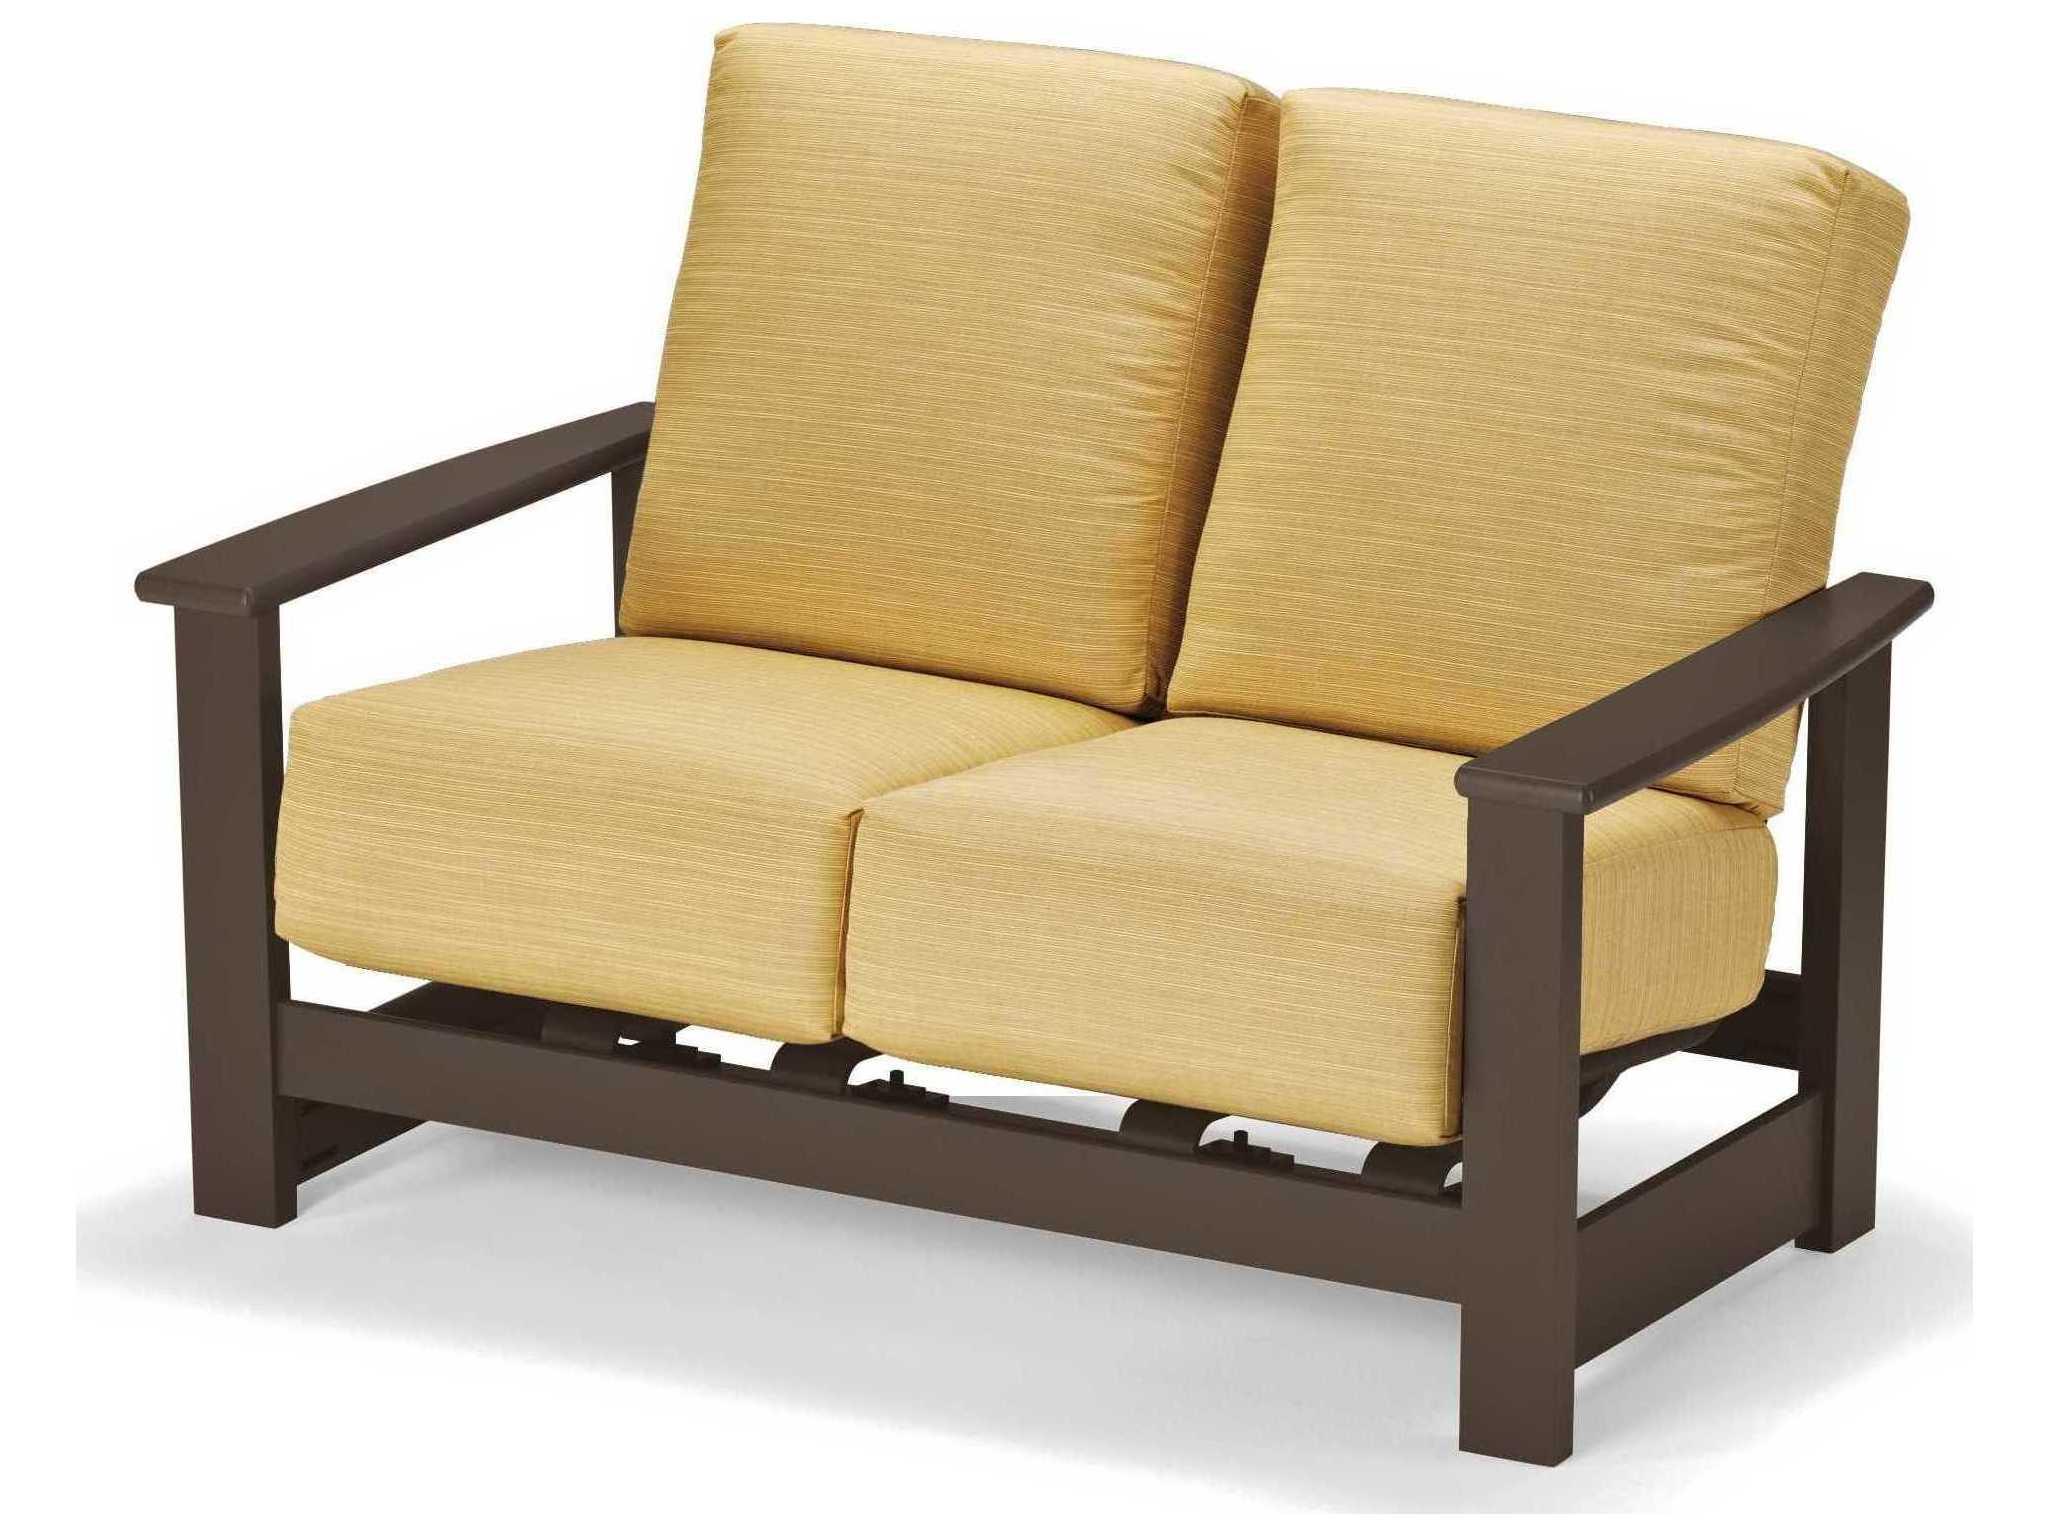 Telescope casual leeward deep seat replacement seat and - Deep seat patio cushions replacements ...